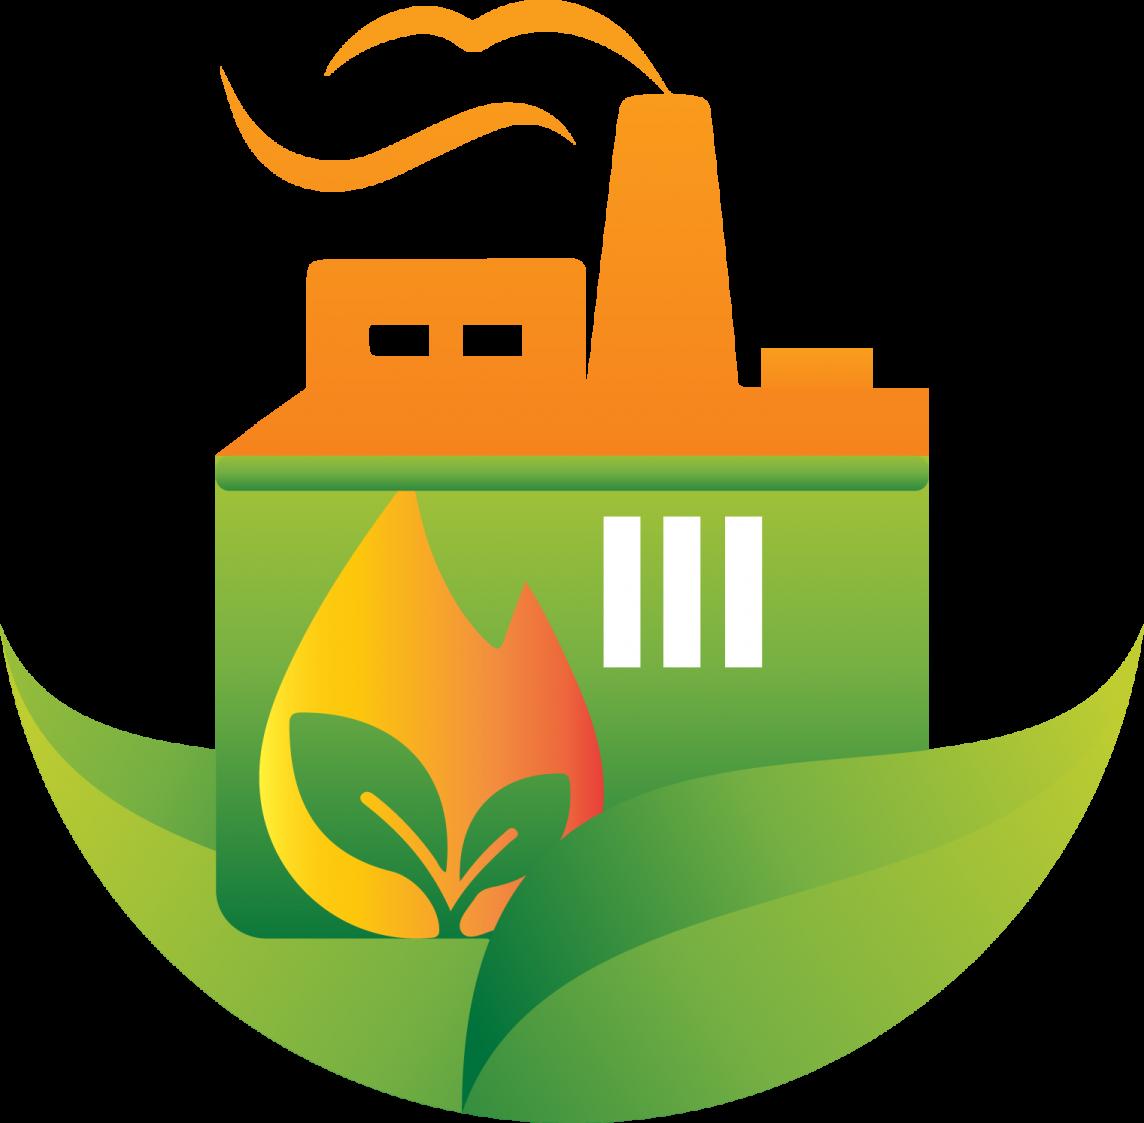 Biomass renewable biofuel development. Nut clipart energy